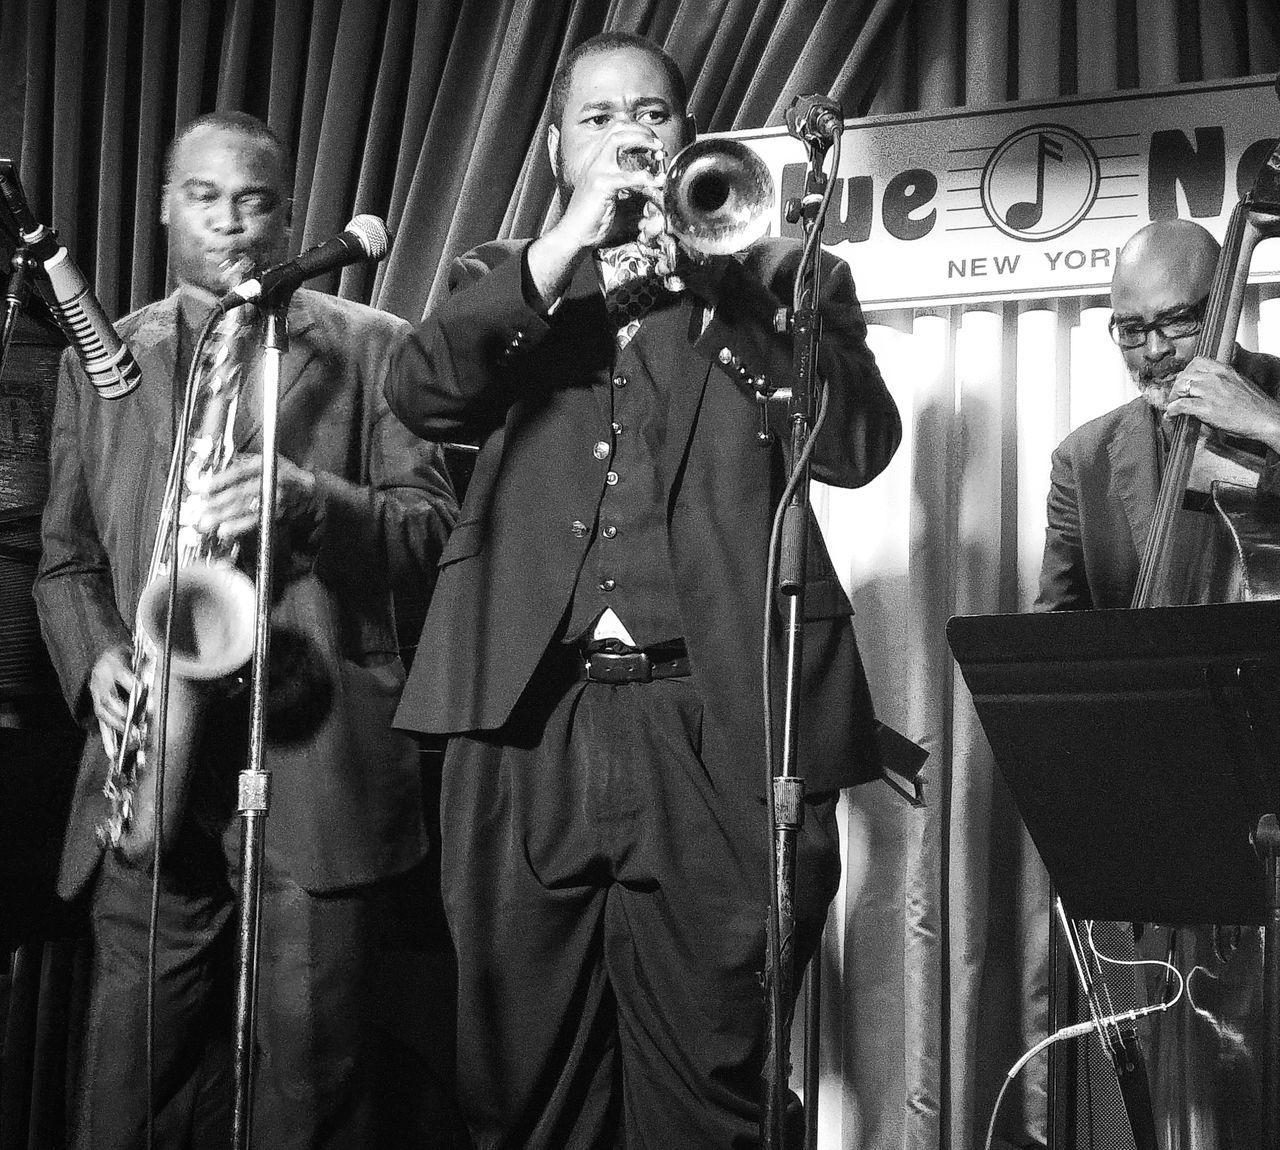 James Carter Jazz Blue Note New York City Jazz Club The Week On EyeEm EyeEmNewHere